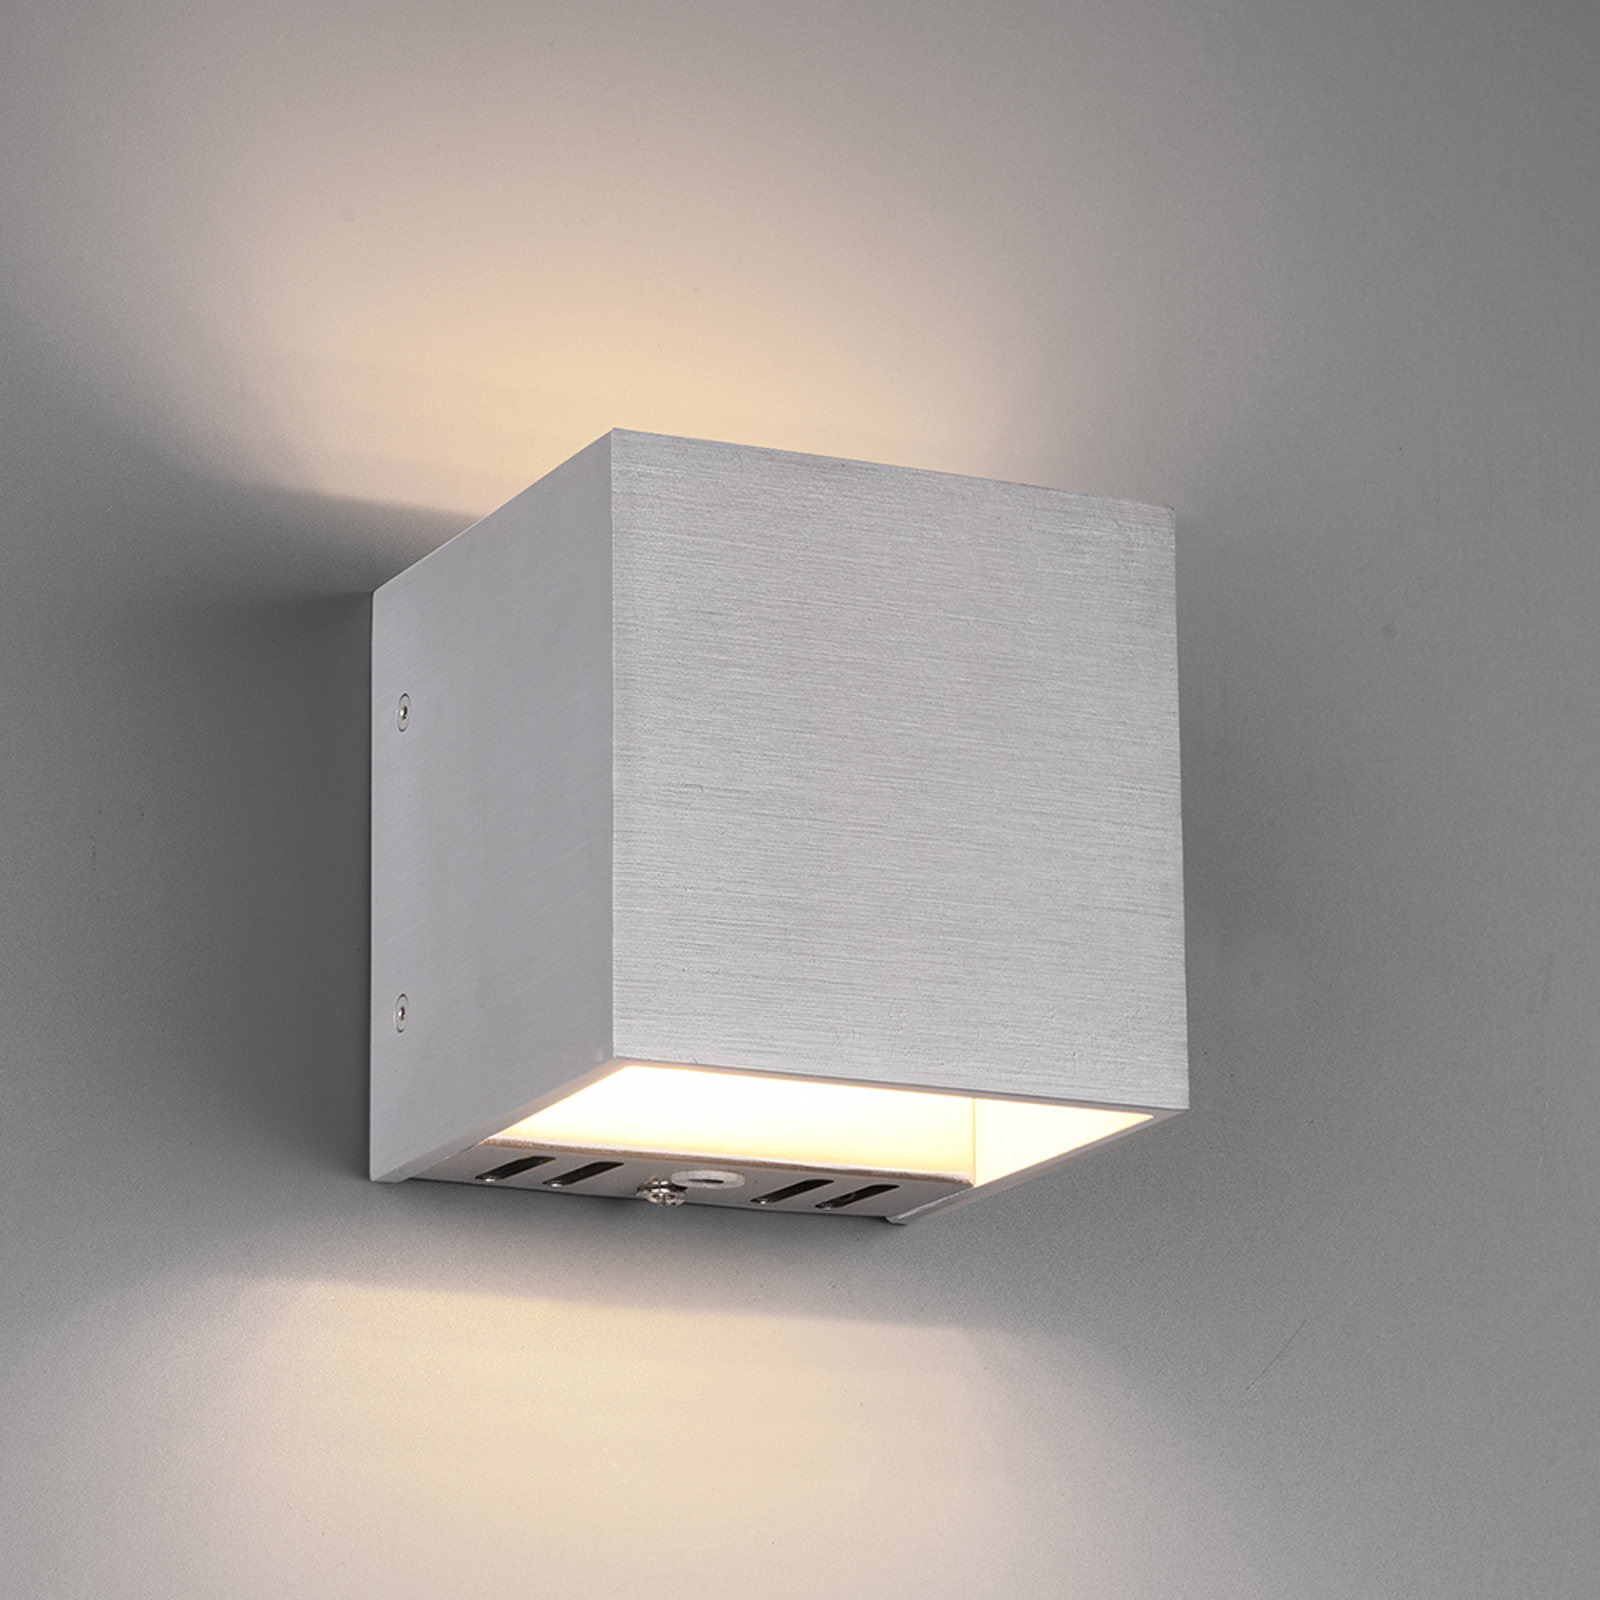 Trio WiZ Figo LED wandlamp, aluminium geborsteld